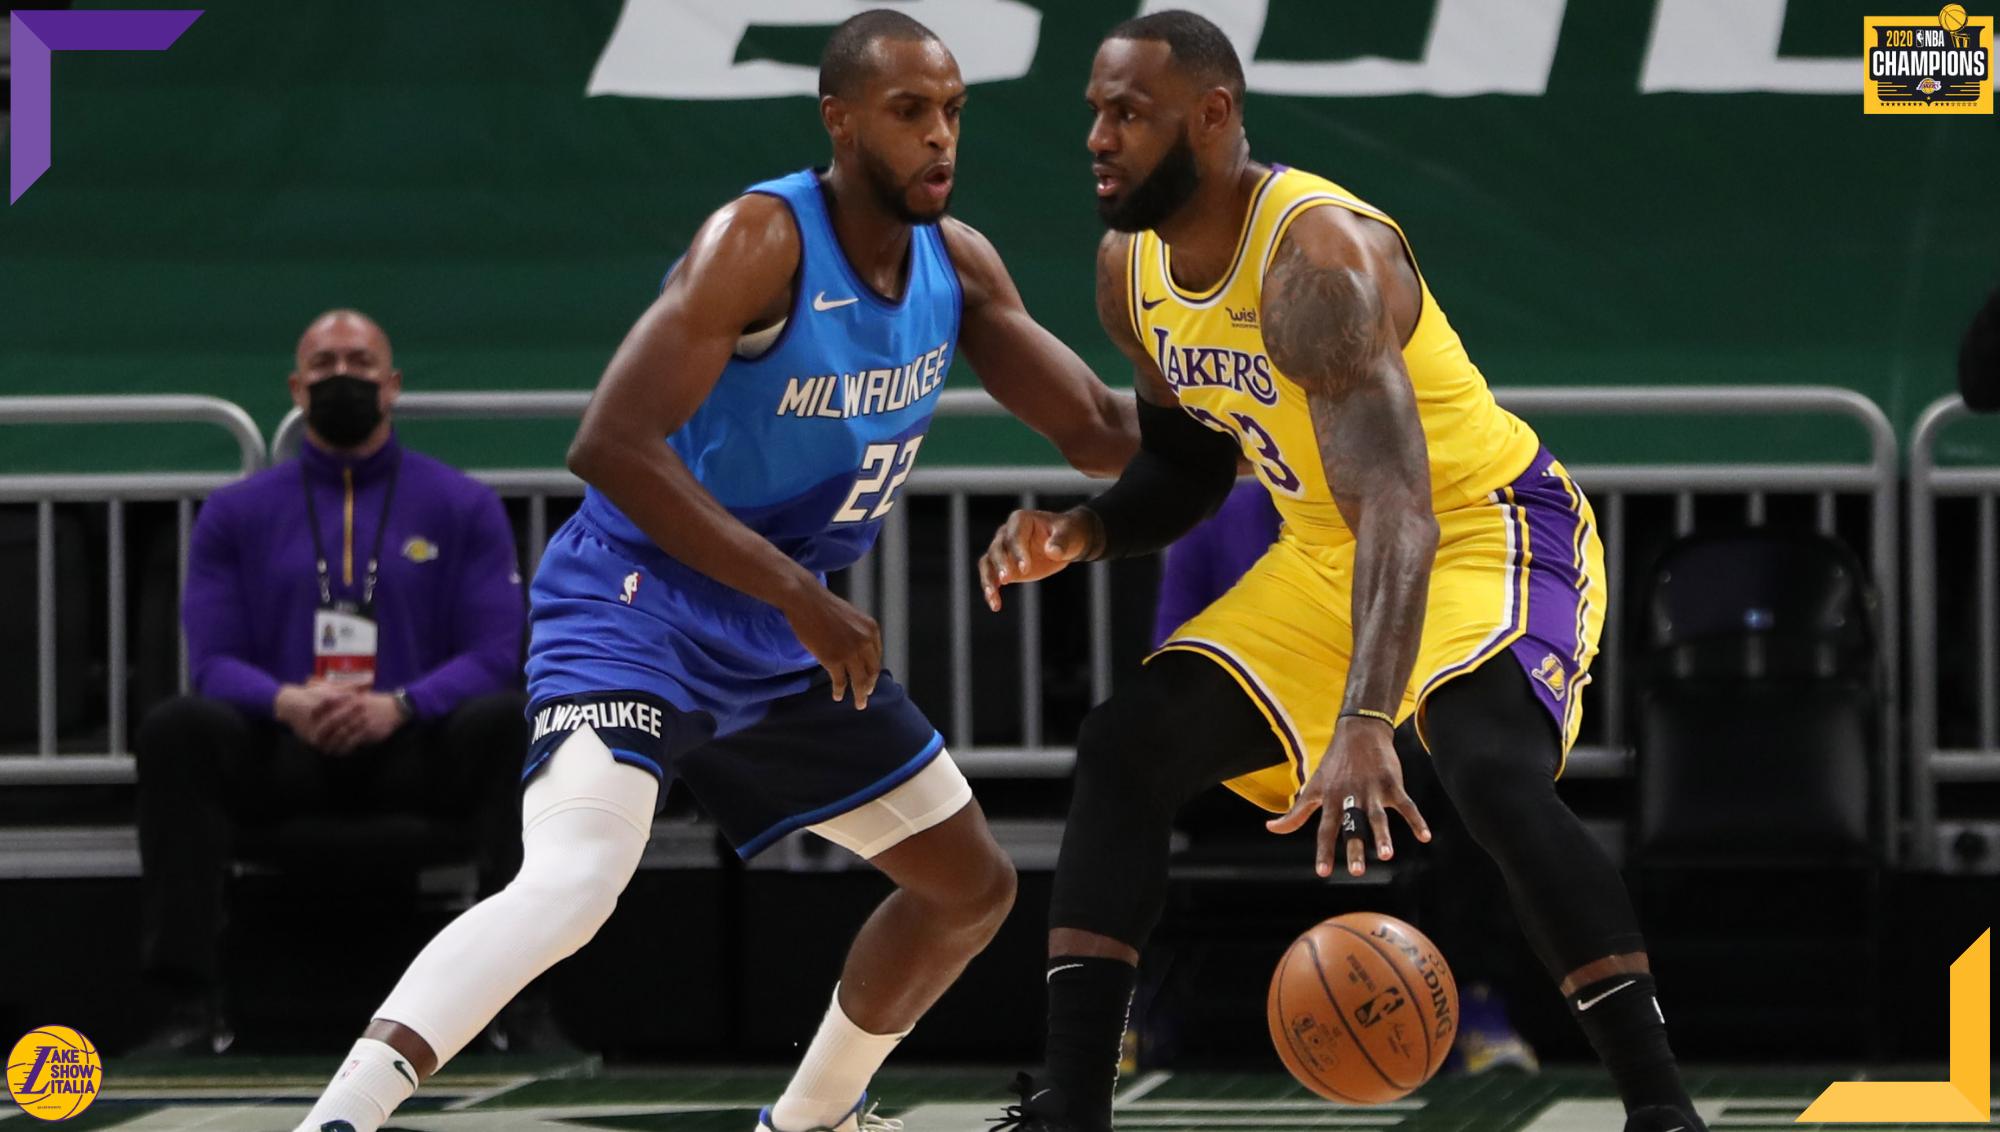 LeBron James and Khris Middleton, Los Angeles Lakers vs Milwaukee Bucks